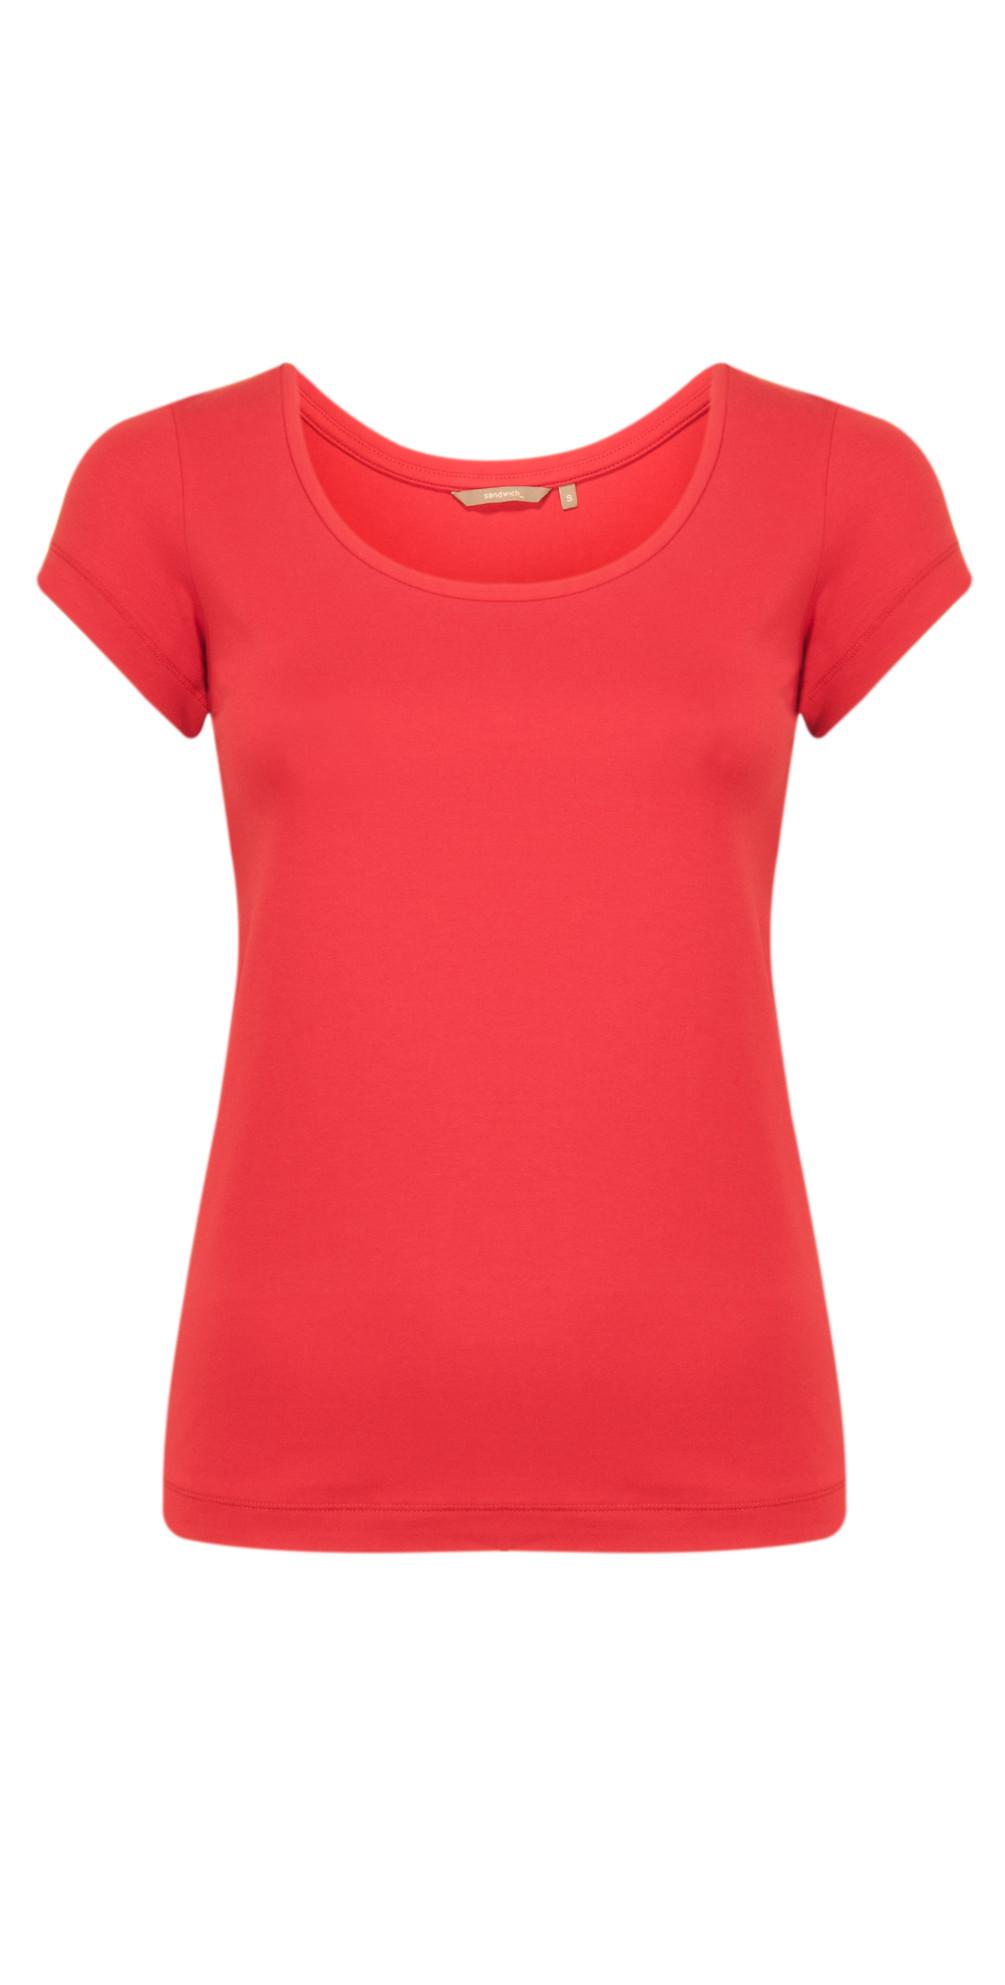 Short Sleeve Light Cotton T-shirt main image